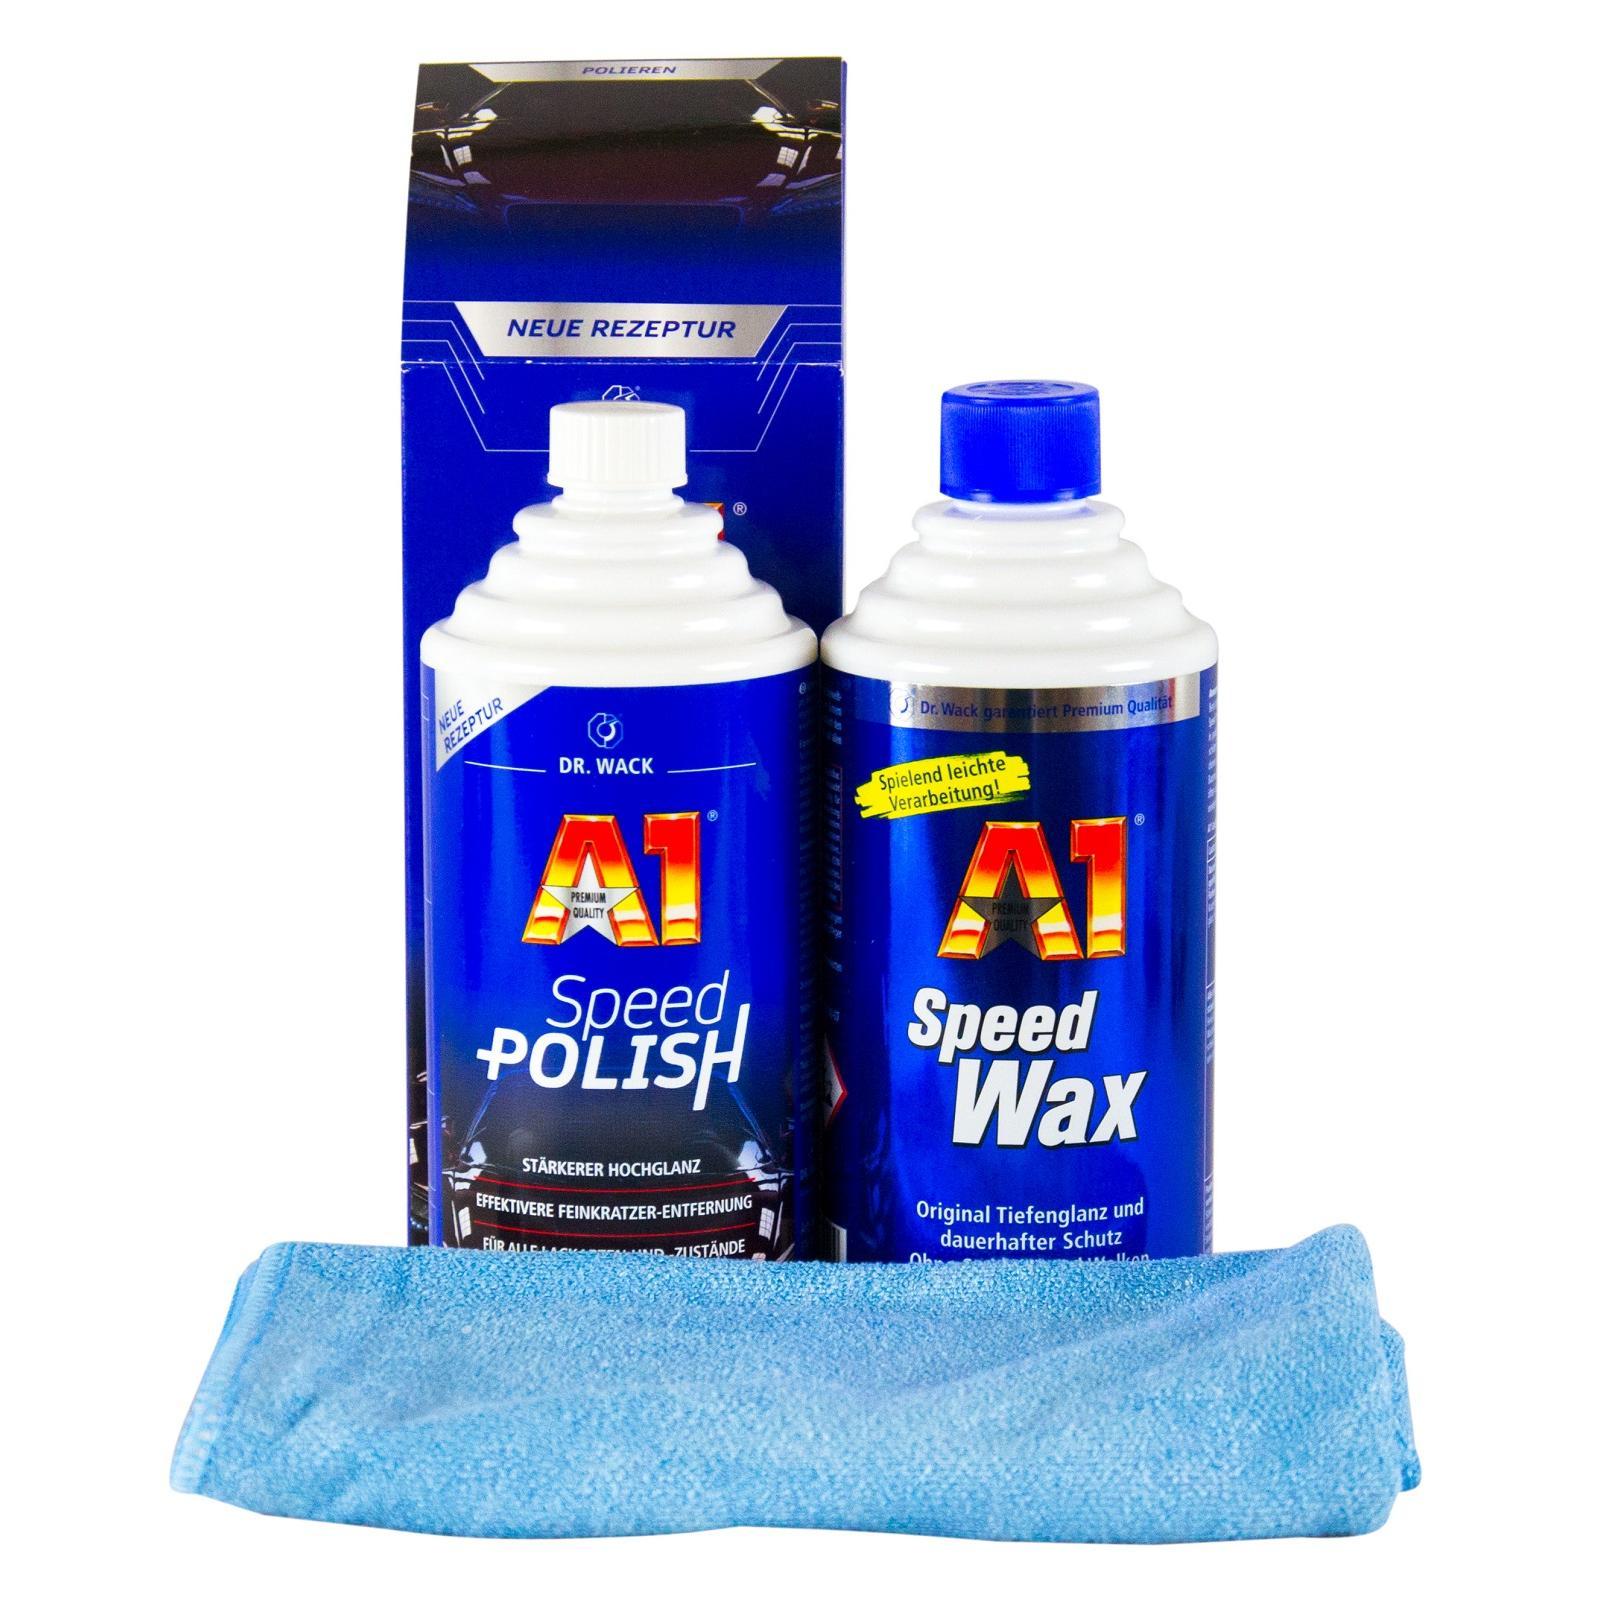 dr wack 1x a1 speed polish politur speed wax wachs 500. Black Bedroom Furniture Sets. Home Design Ideas